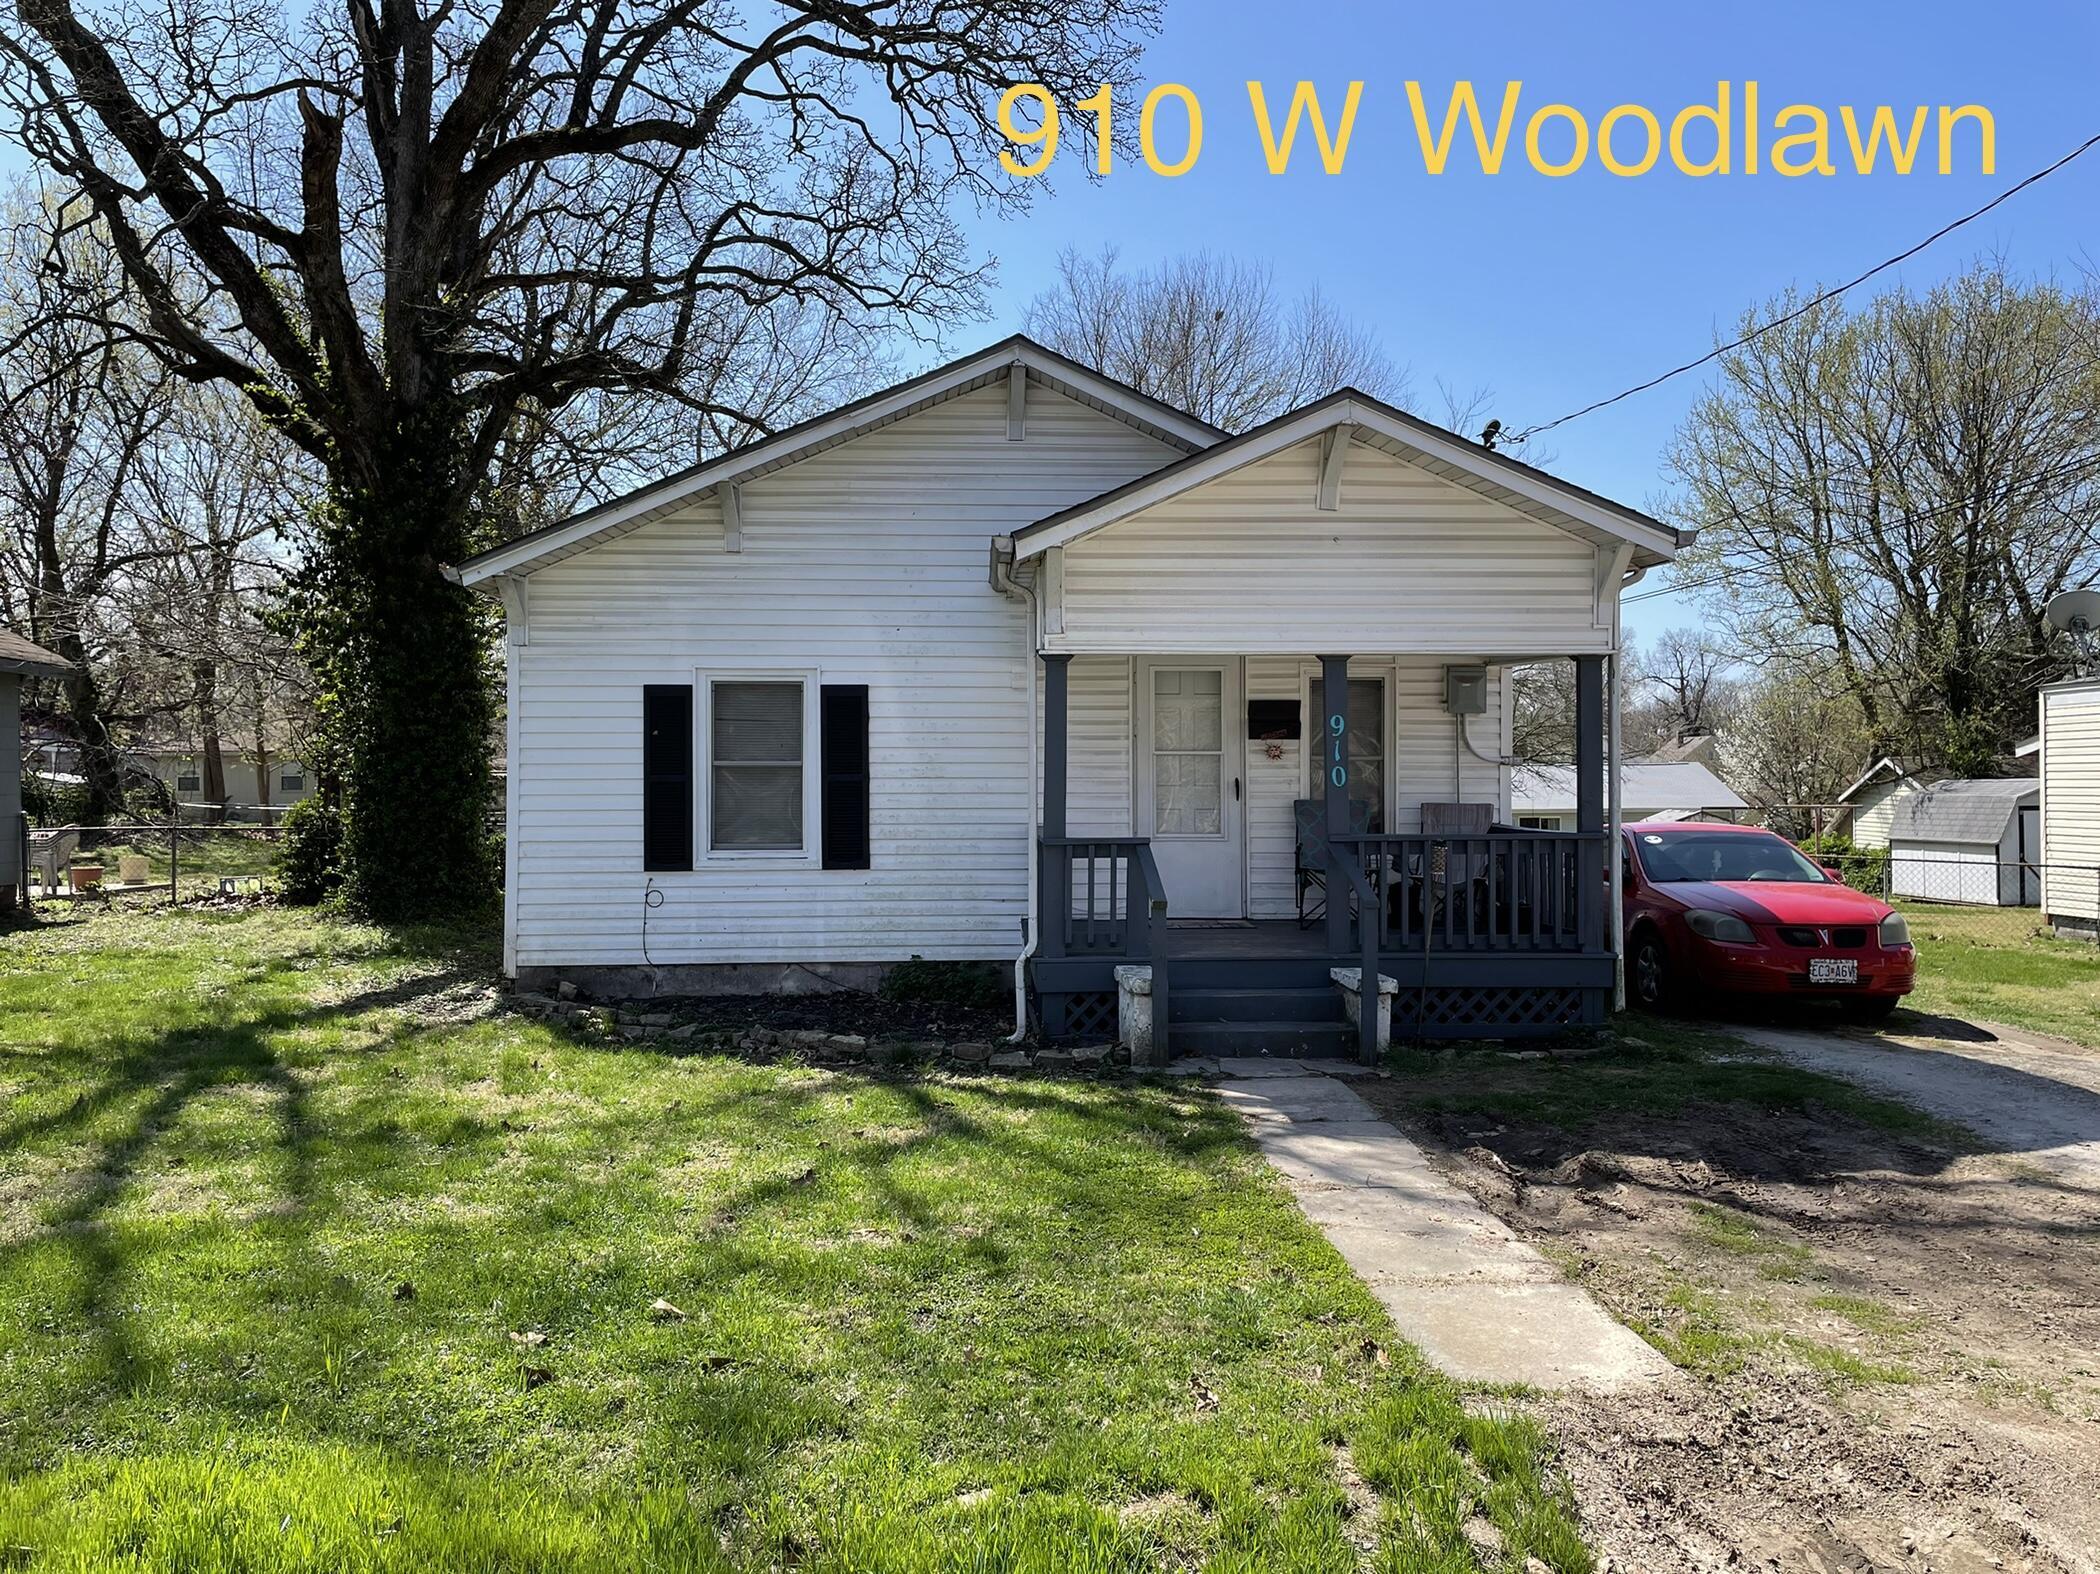 910 West Woodlawn Springfield Mo 65803